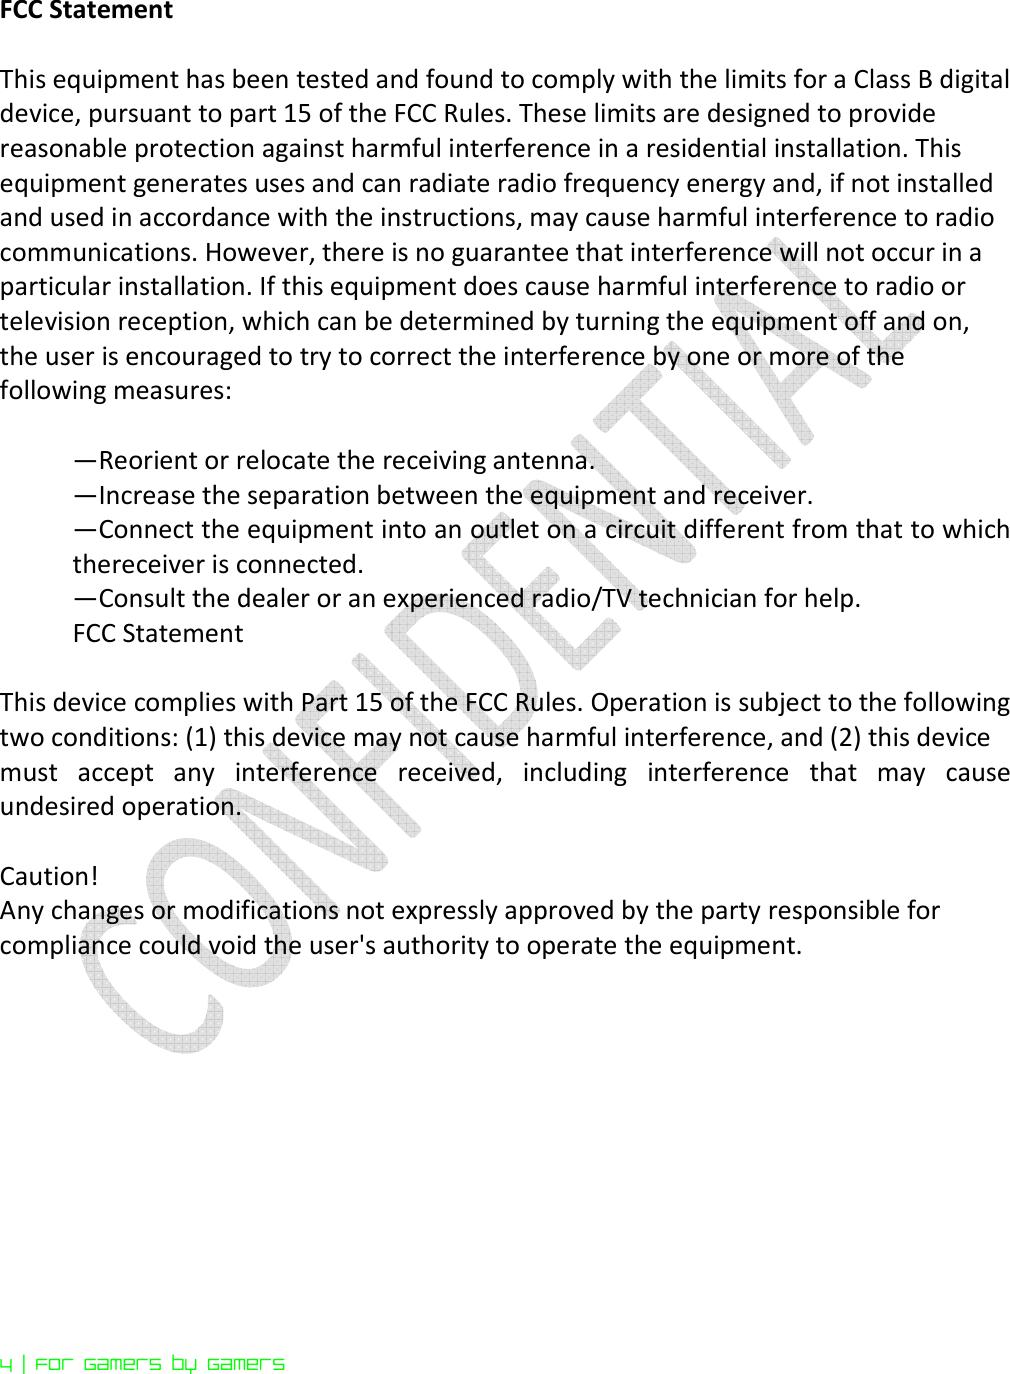 chroma lab instruction manual